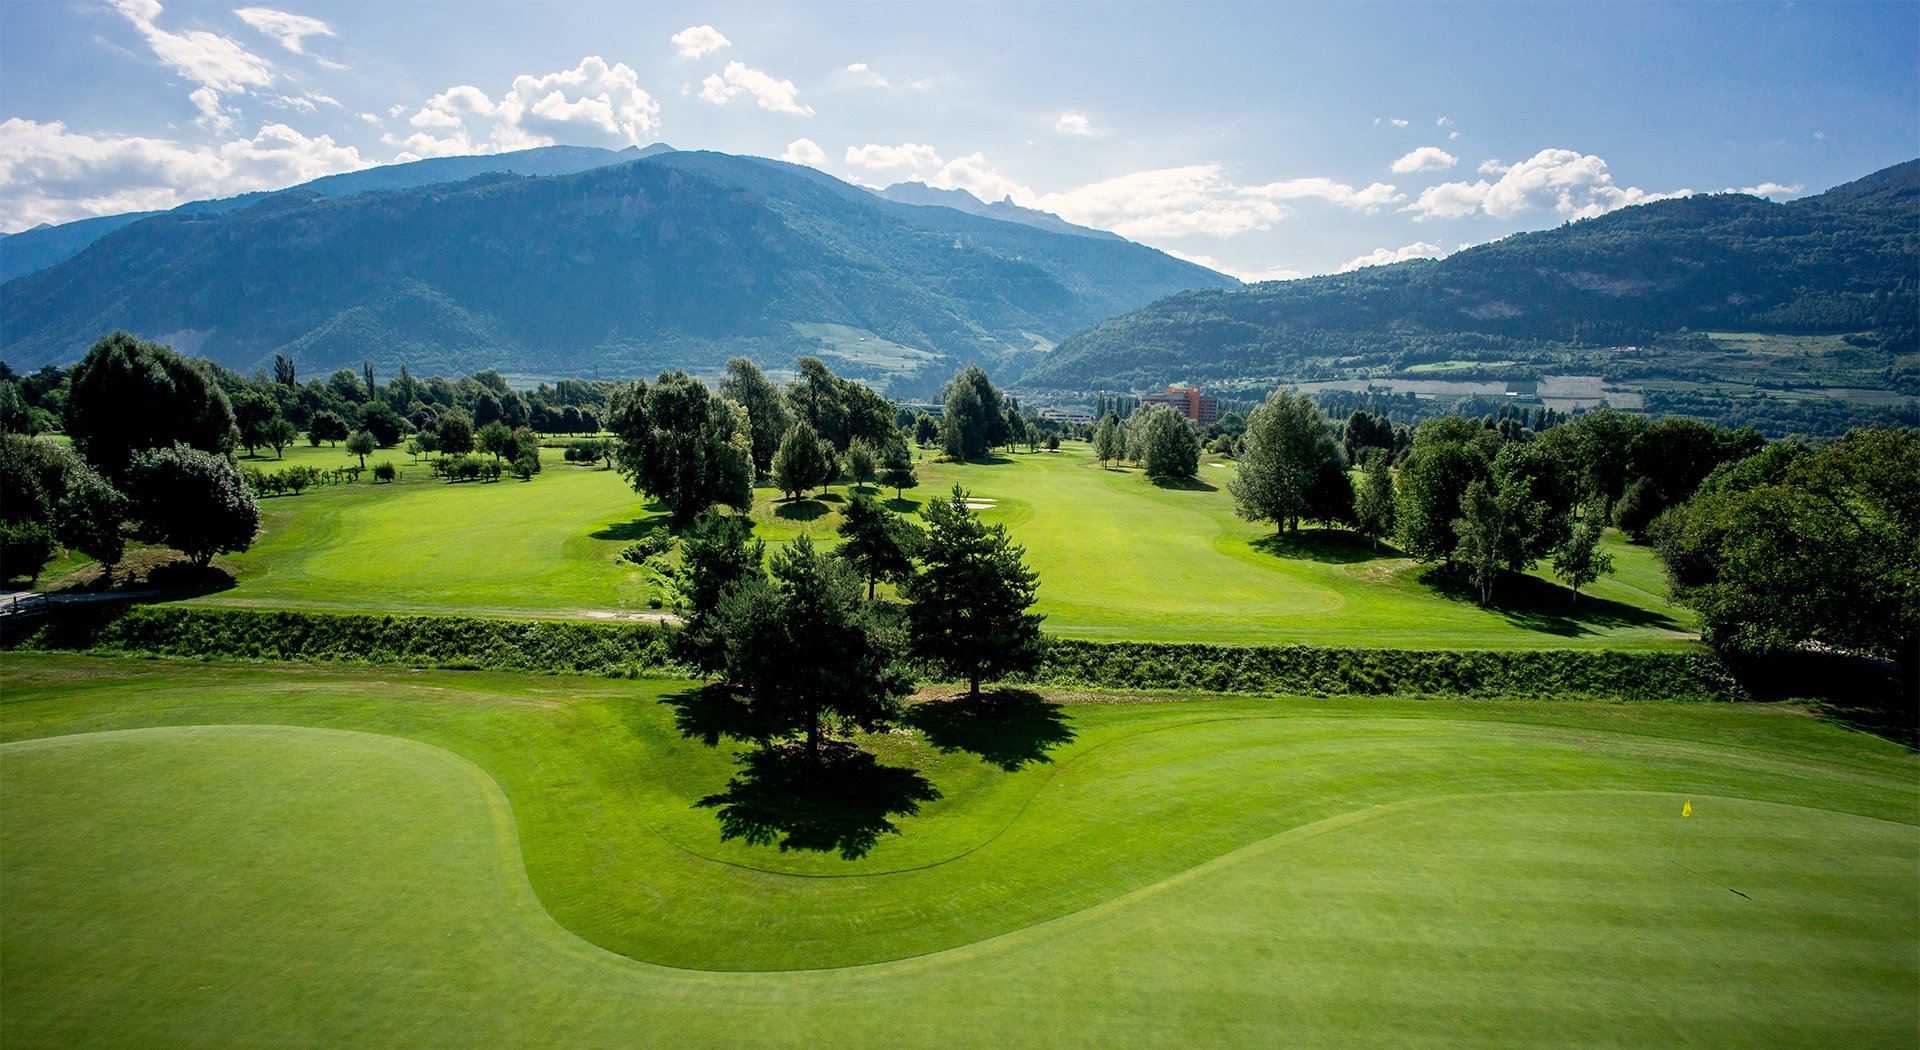 golfplatz sion